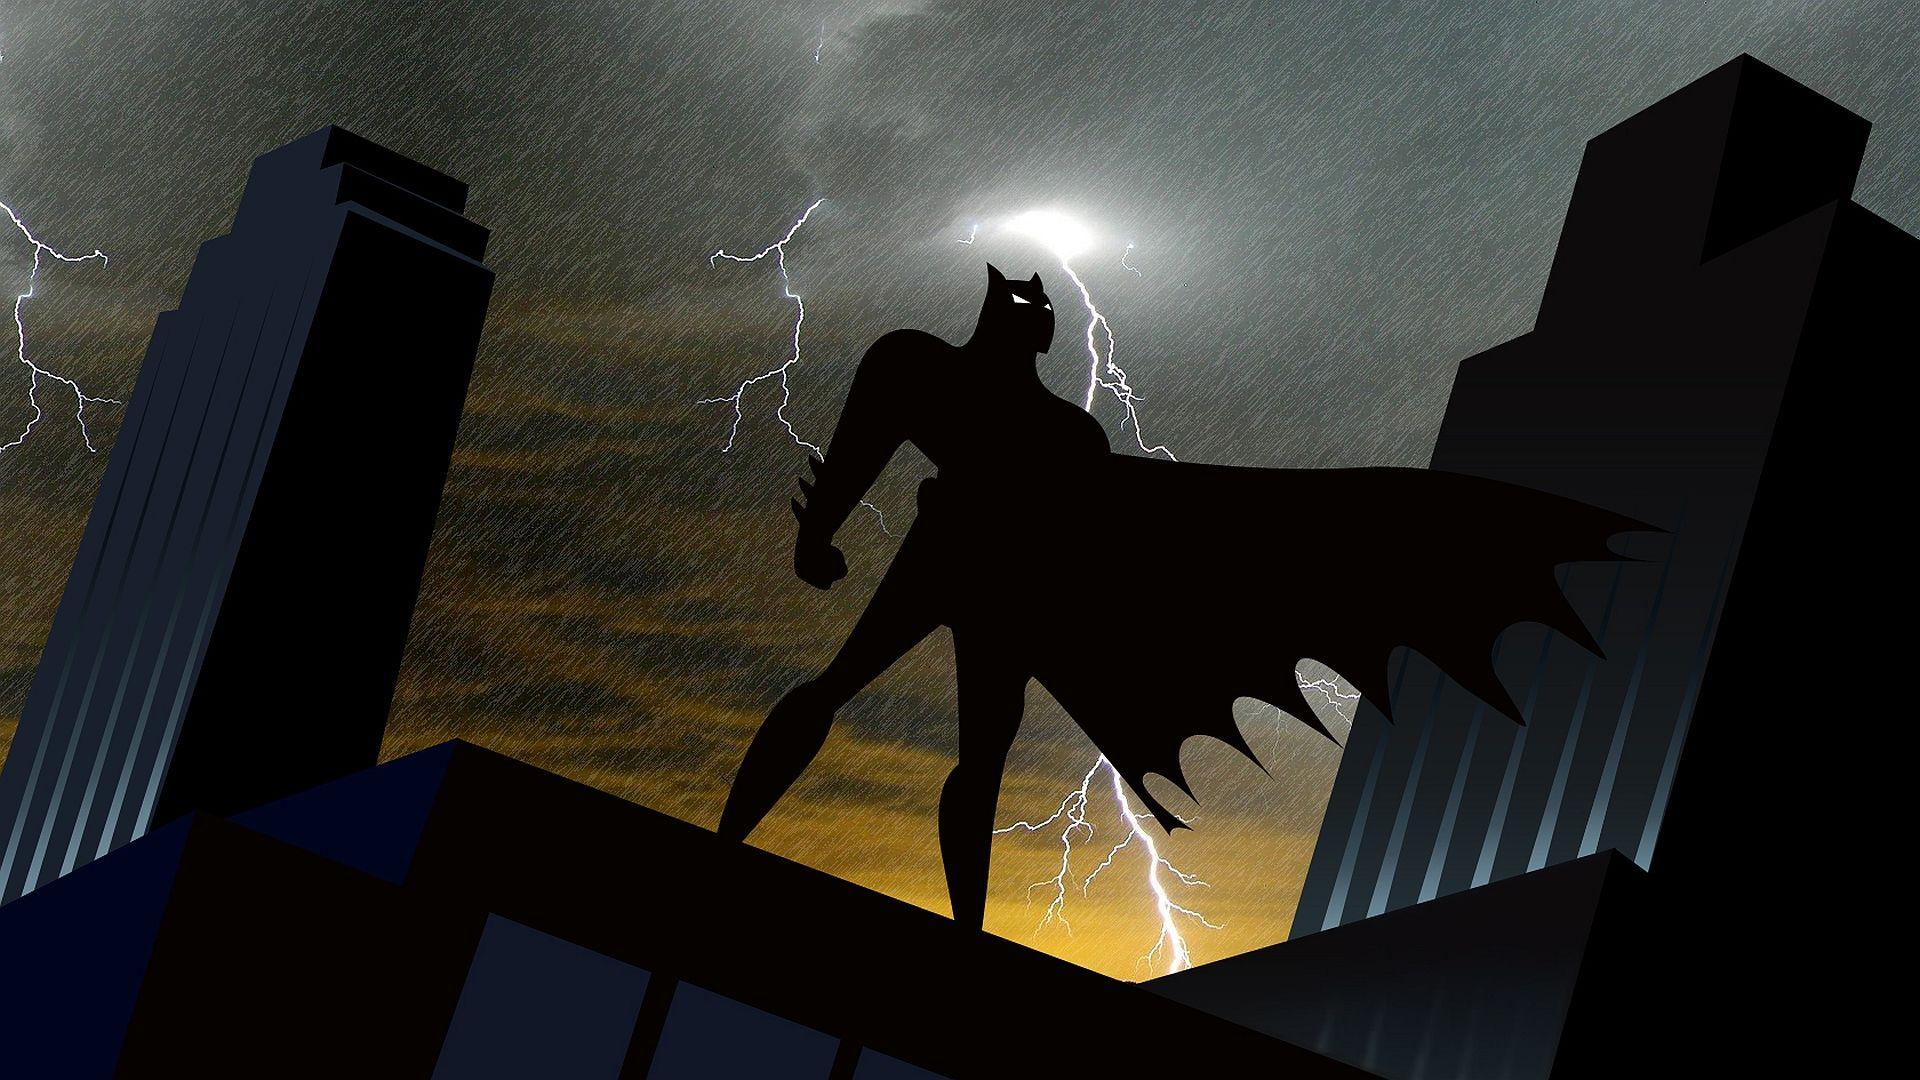 Making It Rain Wallpapers Up In Here Batman Cartoon Batman Wallpaper Cartoon Wallpaper